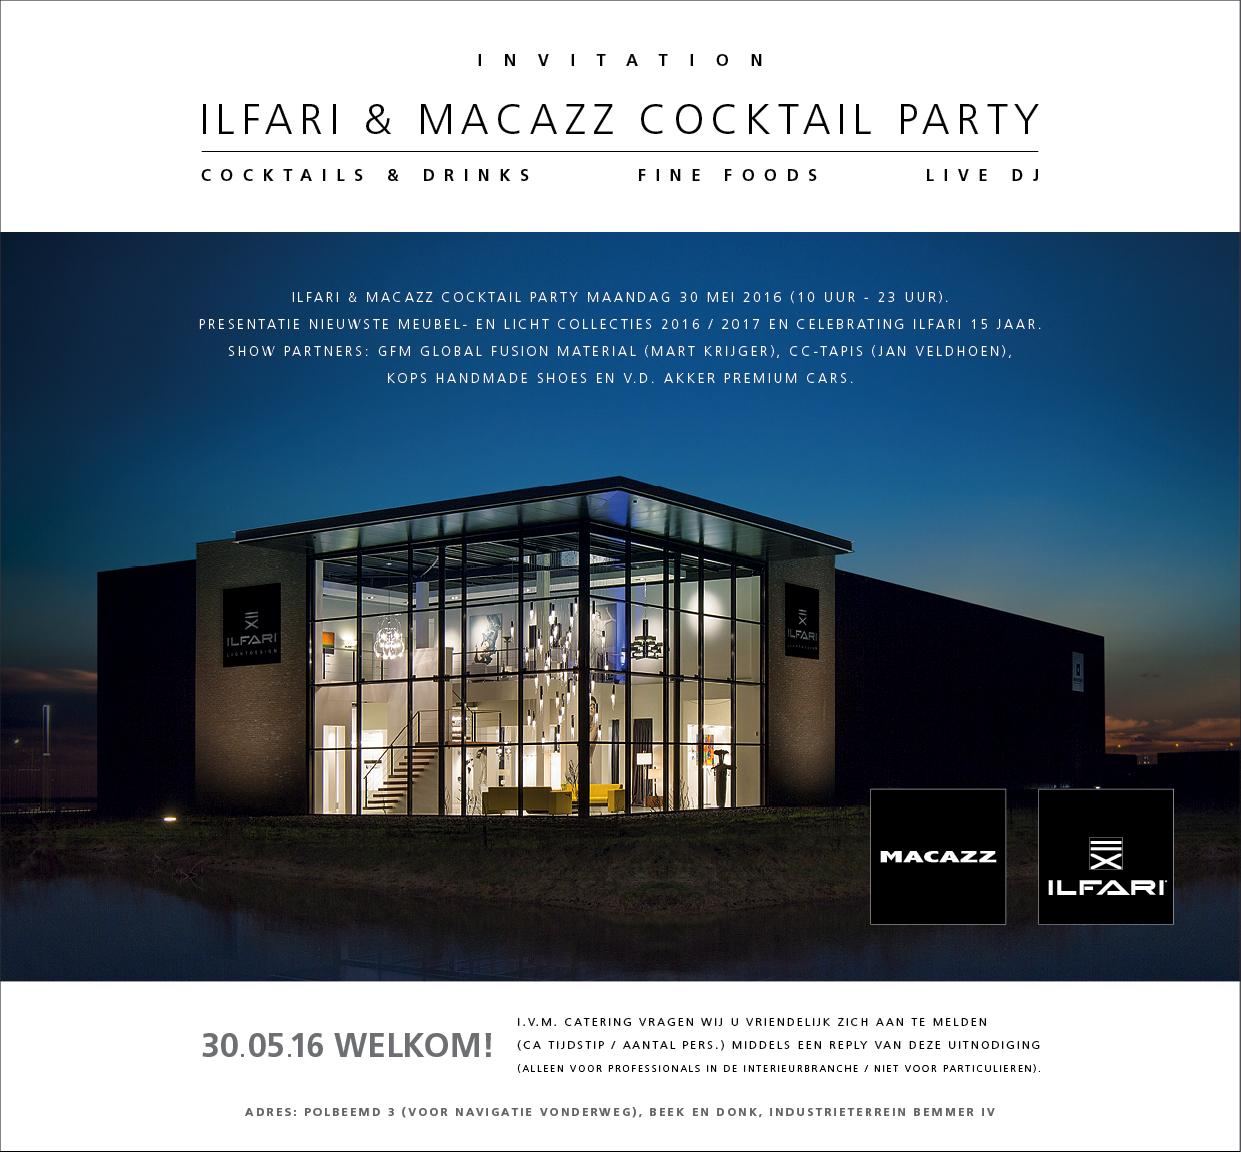 Macazz Cocktail Party Ilfari